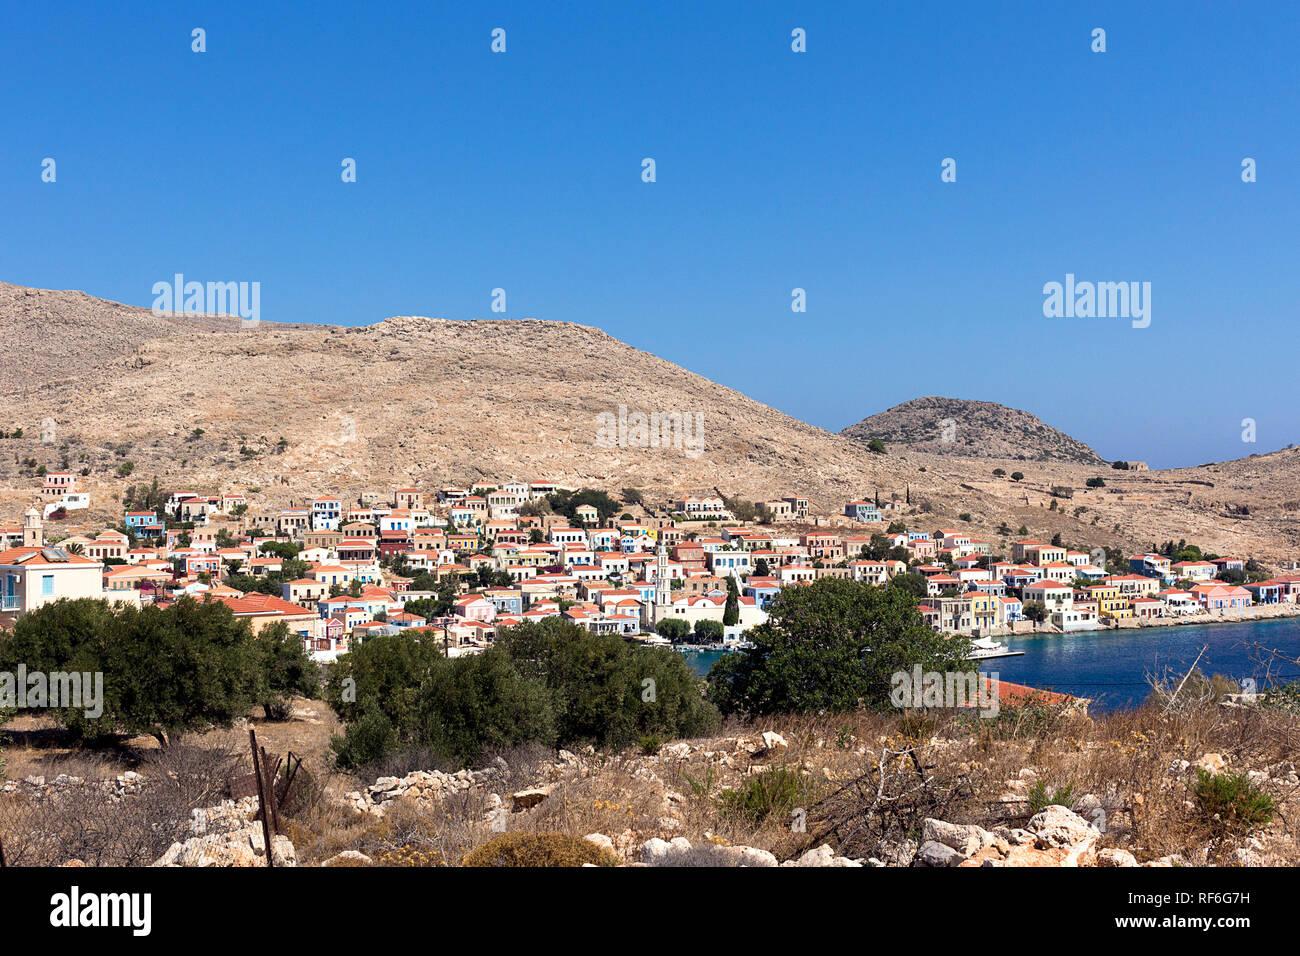 Halki island, panoramic view of Emborios. Aegean sea, Dodecanese Islands, Greece - Stock Image